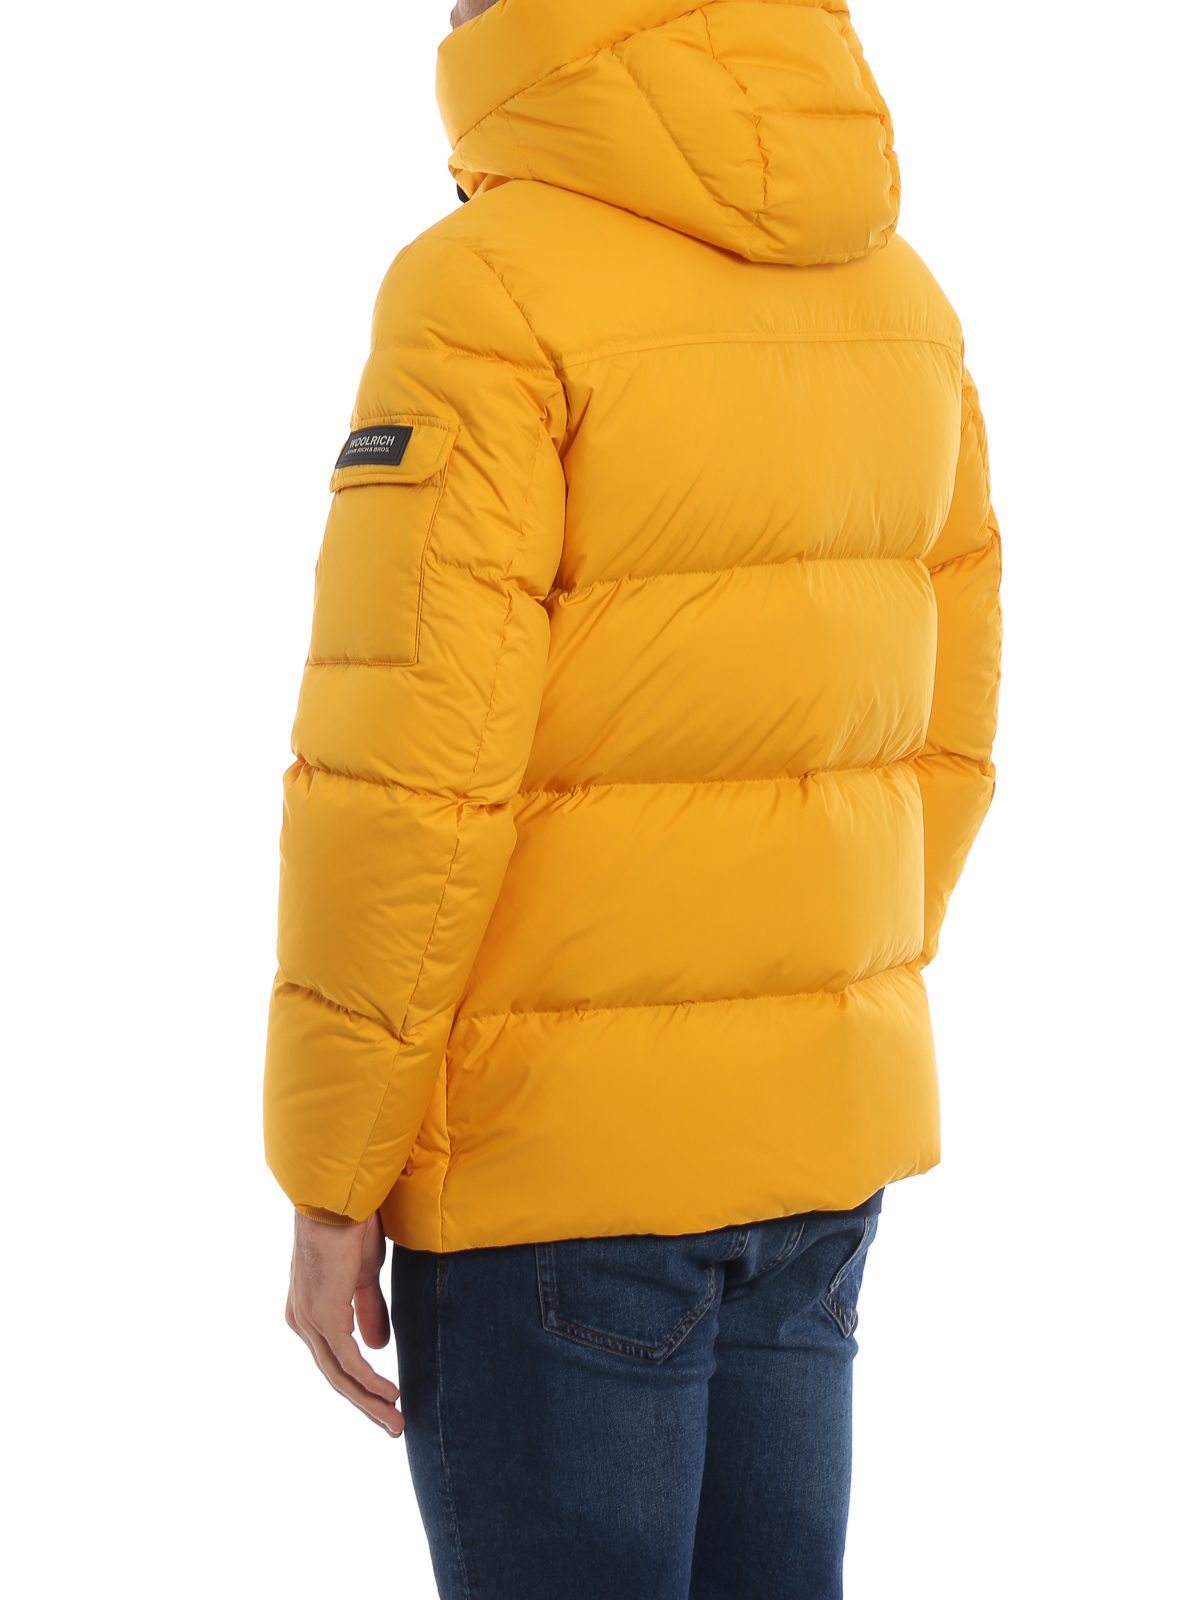 100% authentic fe7db 313ce Woolrich - Piumino giallo ocra Sierra Supreme - giacche ...